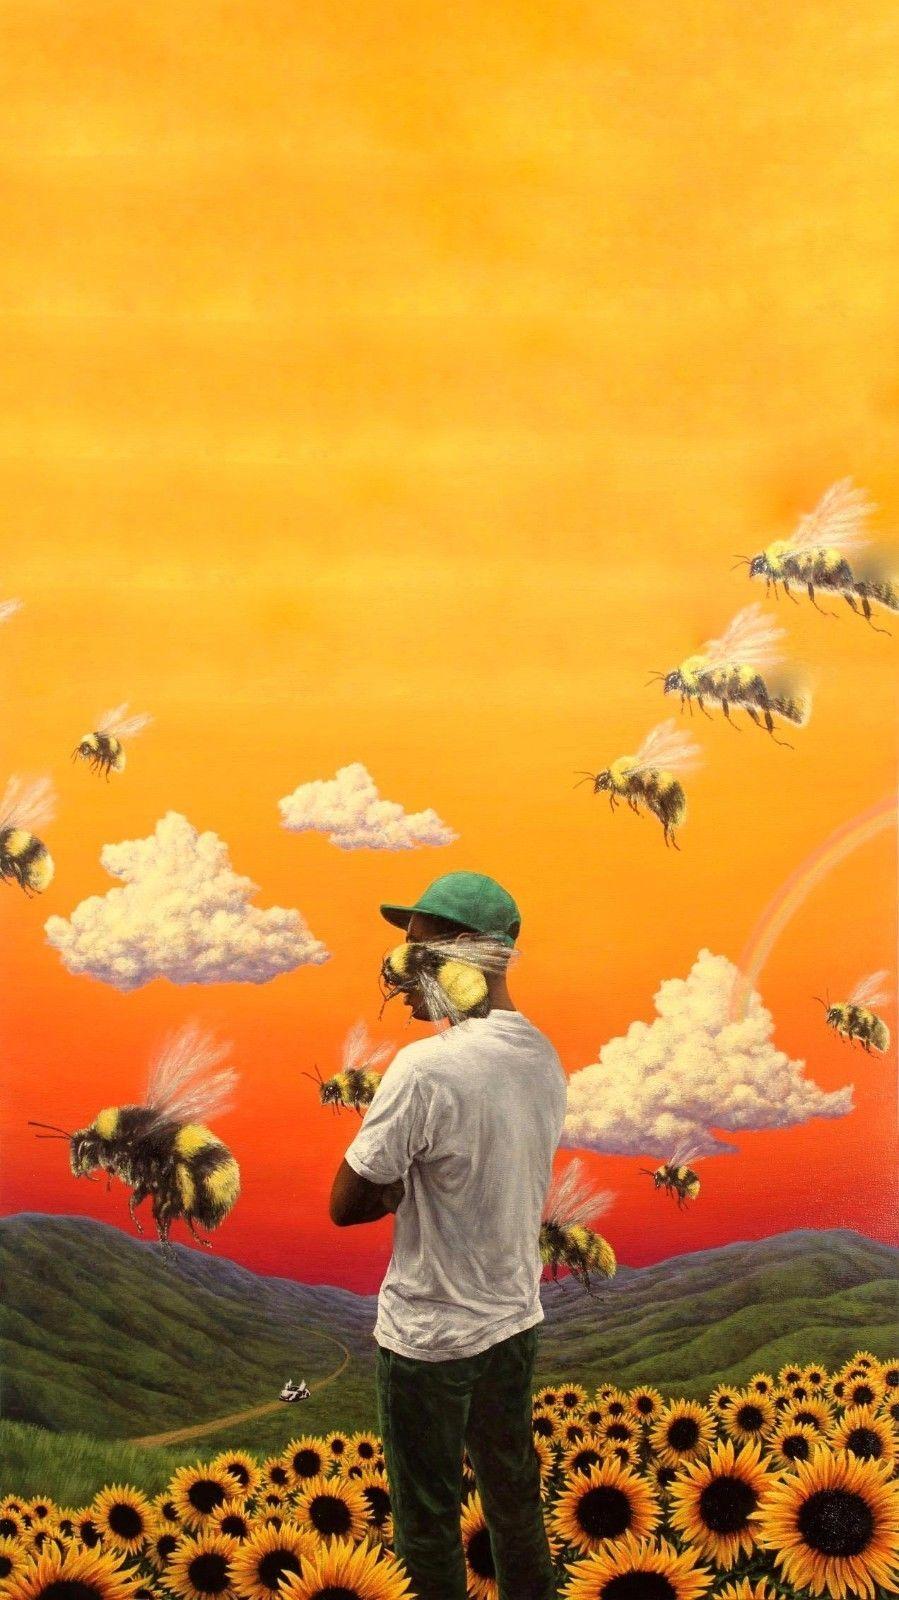 21cbdc289140ad  10.99 - Tyler The Creator Flower Boy Poster Hip Hop Artist Art Print  13X20